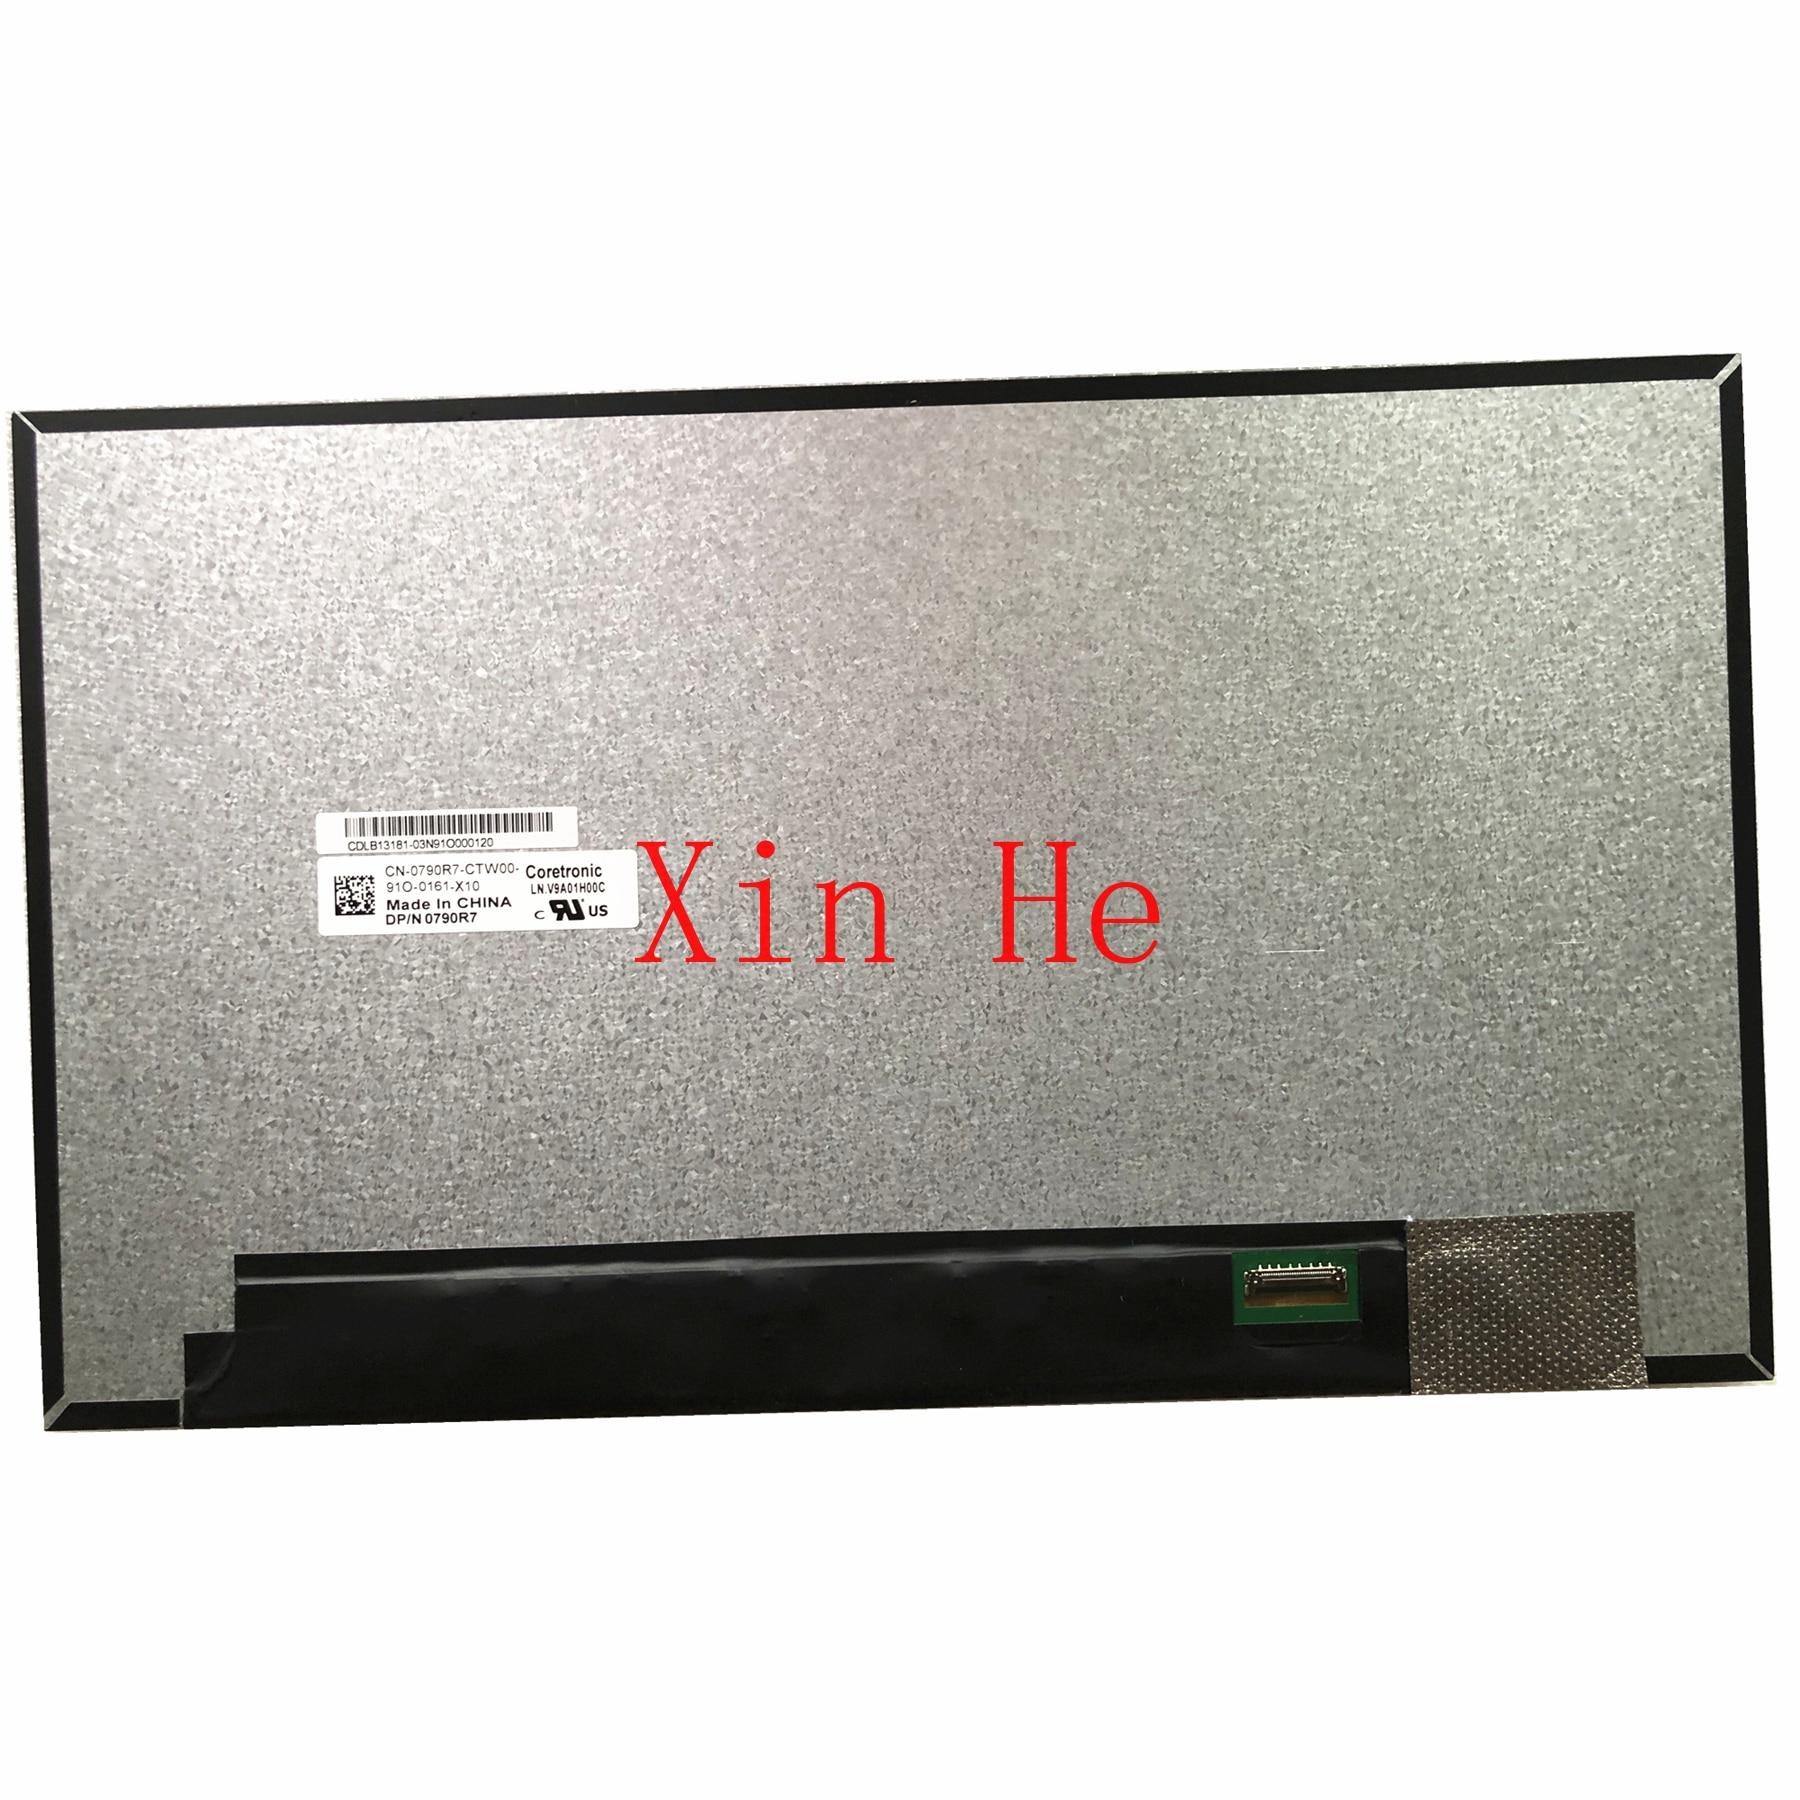 LN.V9A01H00C لوحة شاشة LCD للكمبيوتر المحمول DP/N: 0790R7